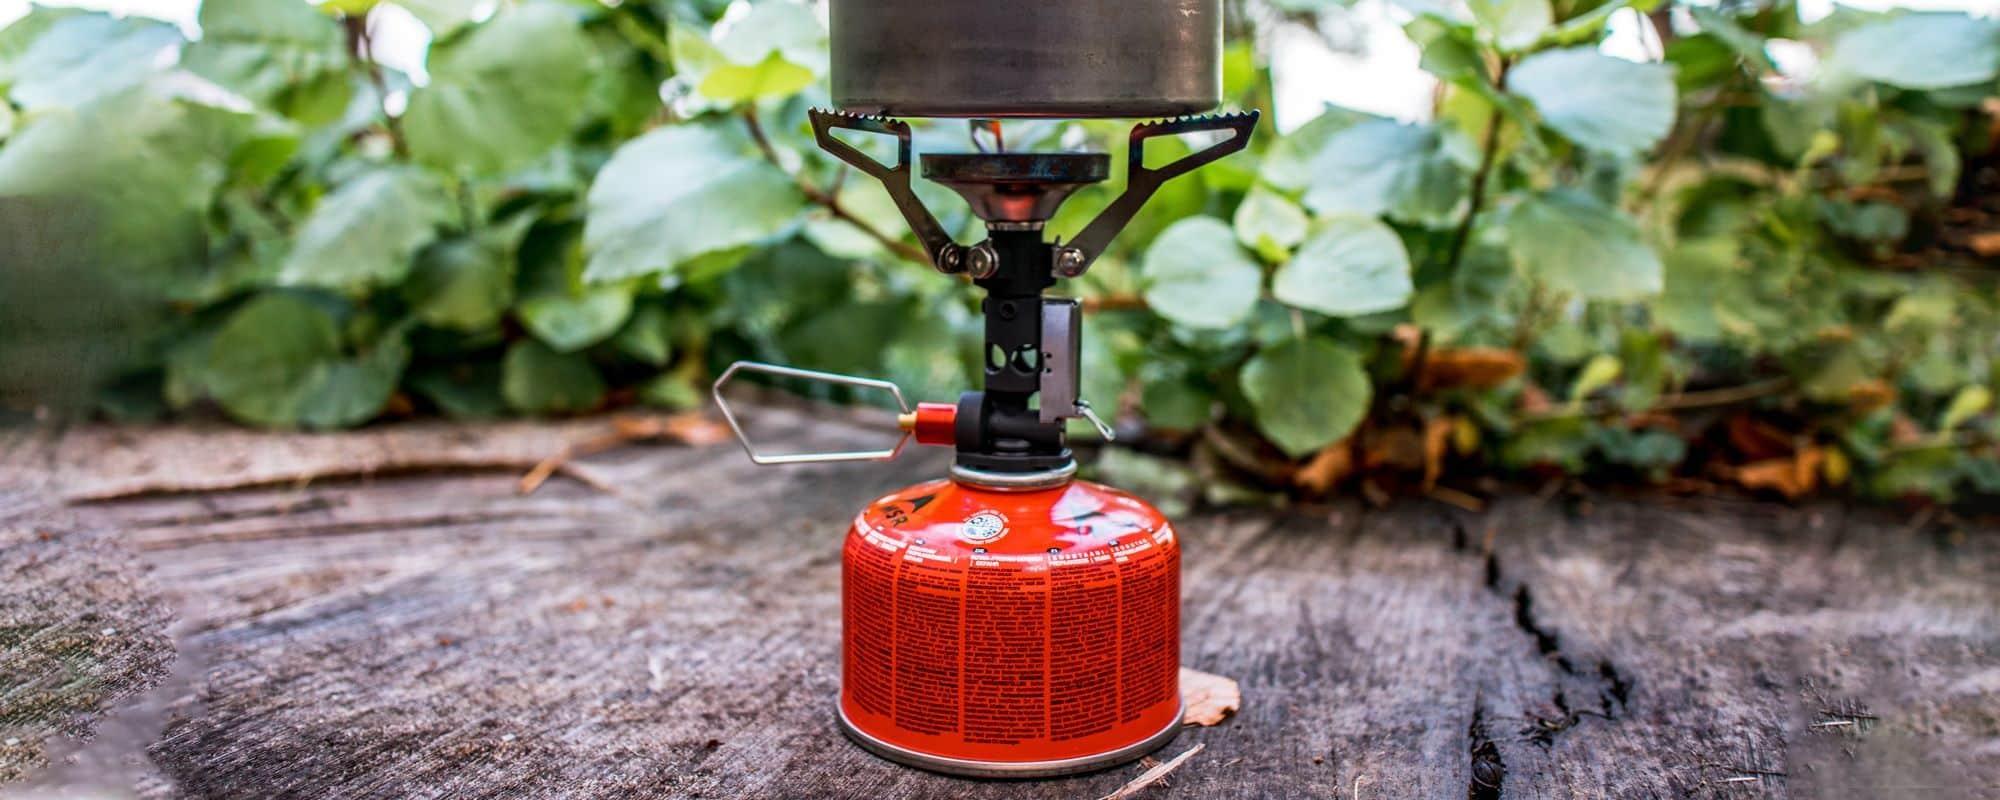 MSR Pocket Rocket Deluxe Test & Experience - strong pocket rocket for the camping kitchen (test winner)